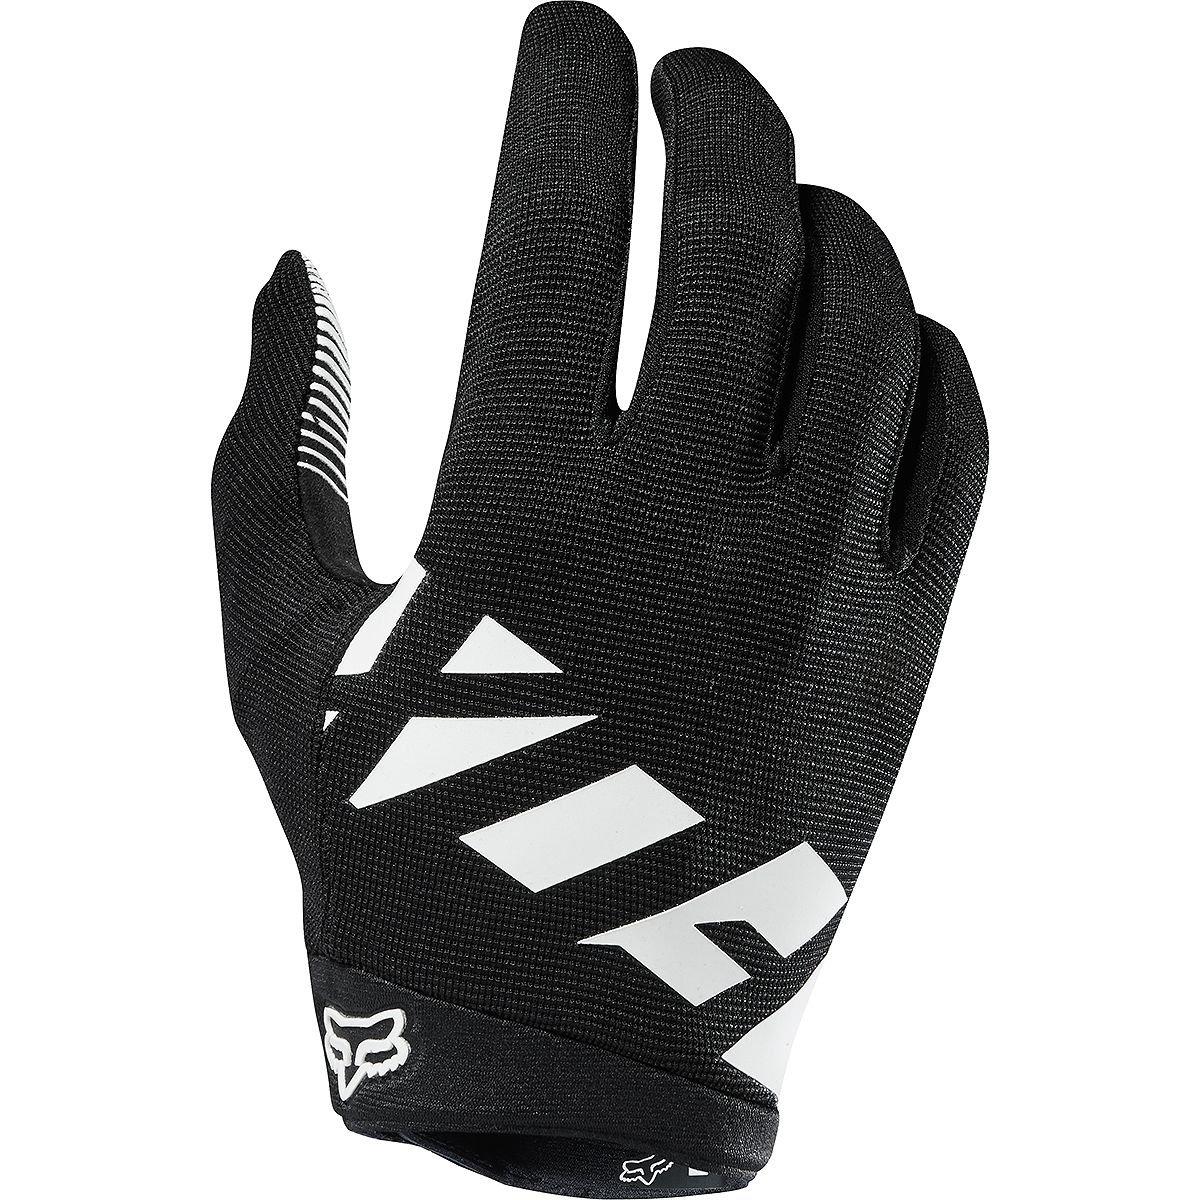 Fox Racing Ranger Glove - 21447 (Black/White - 2X)